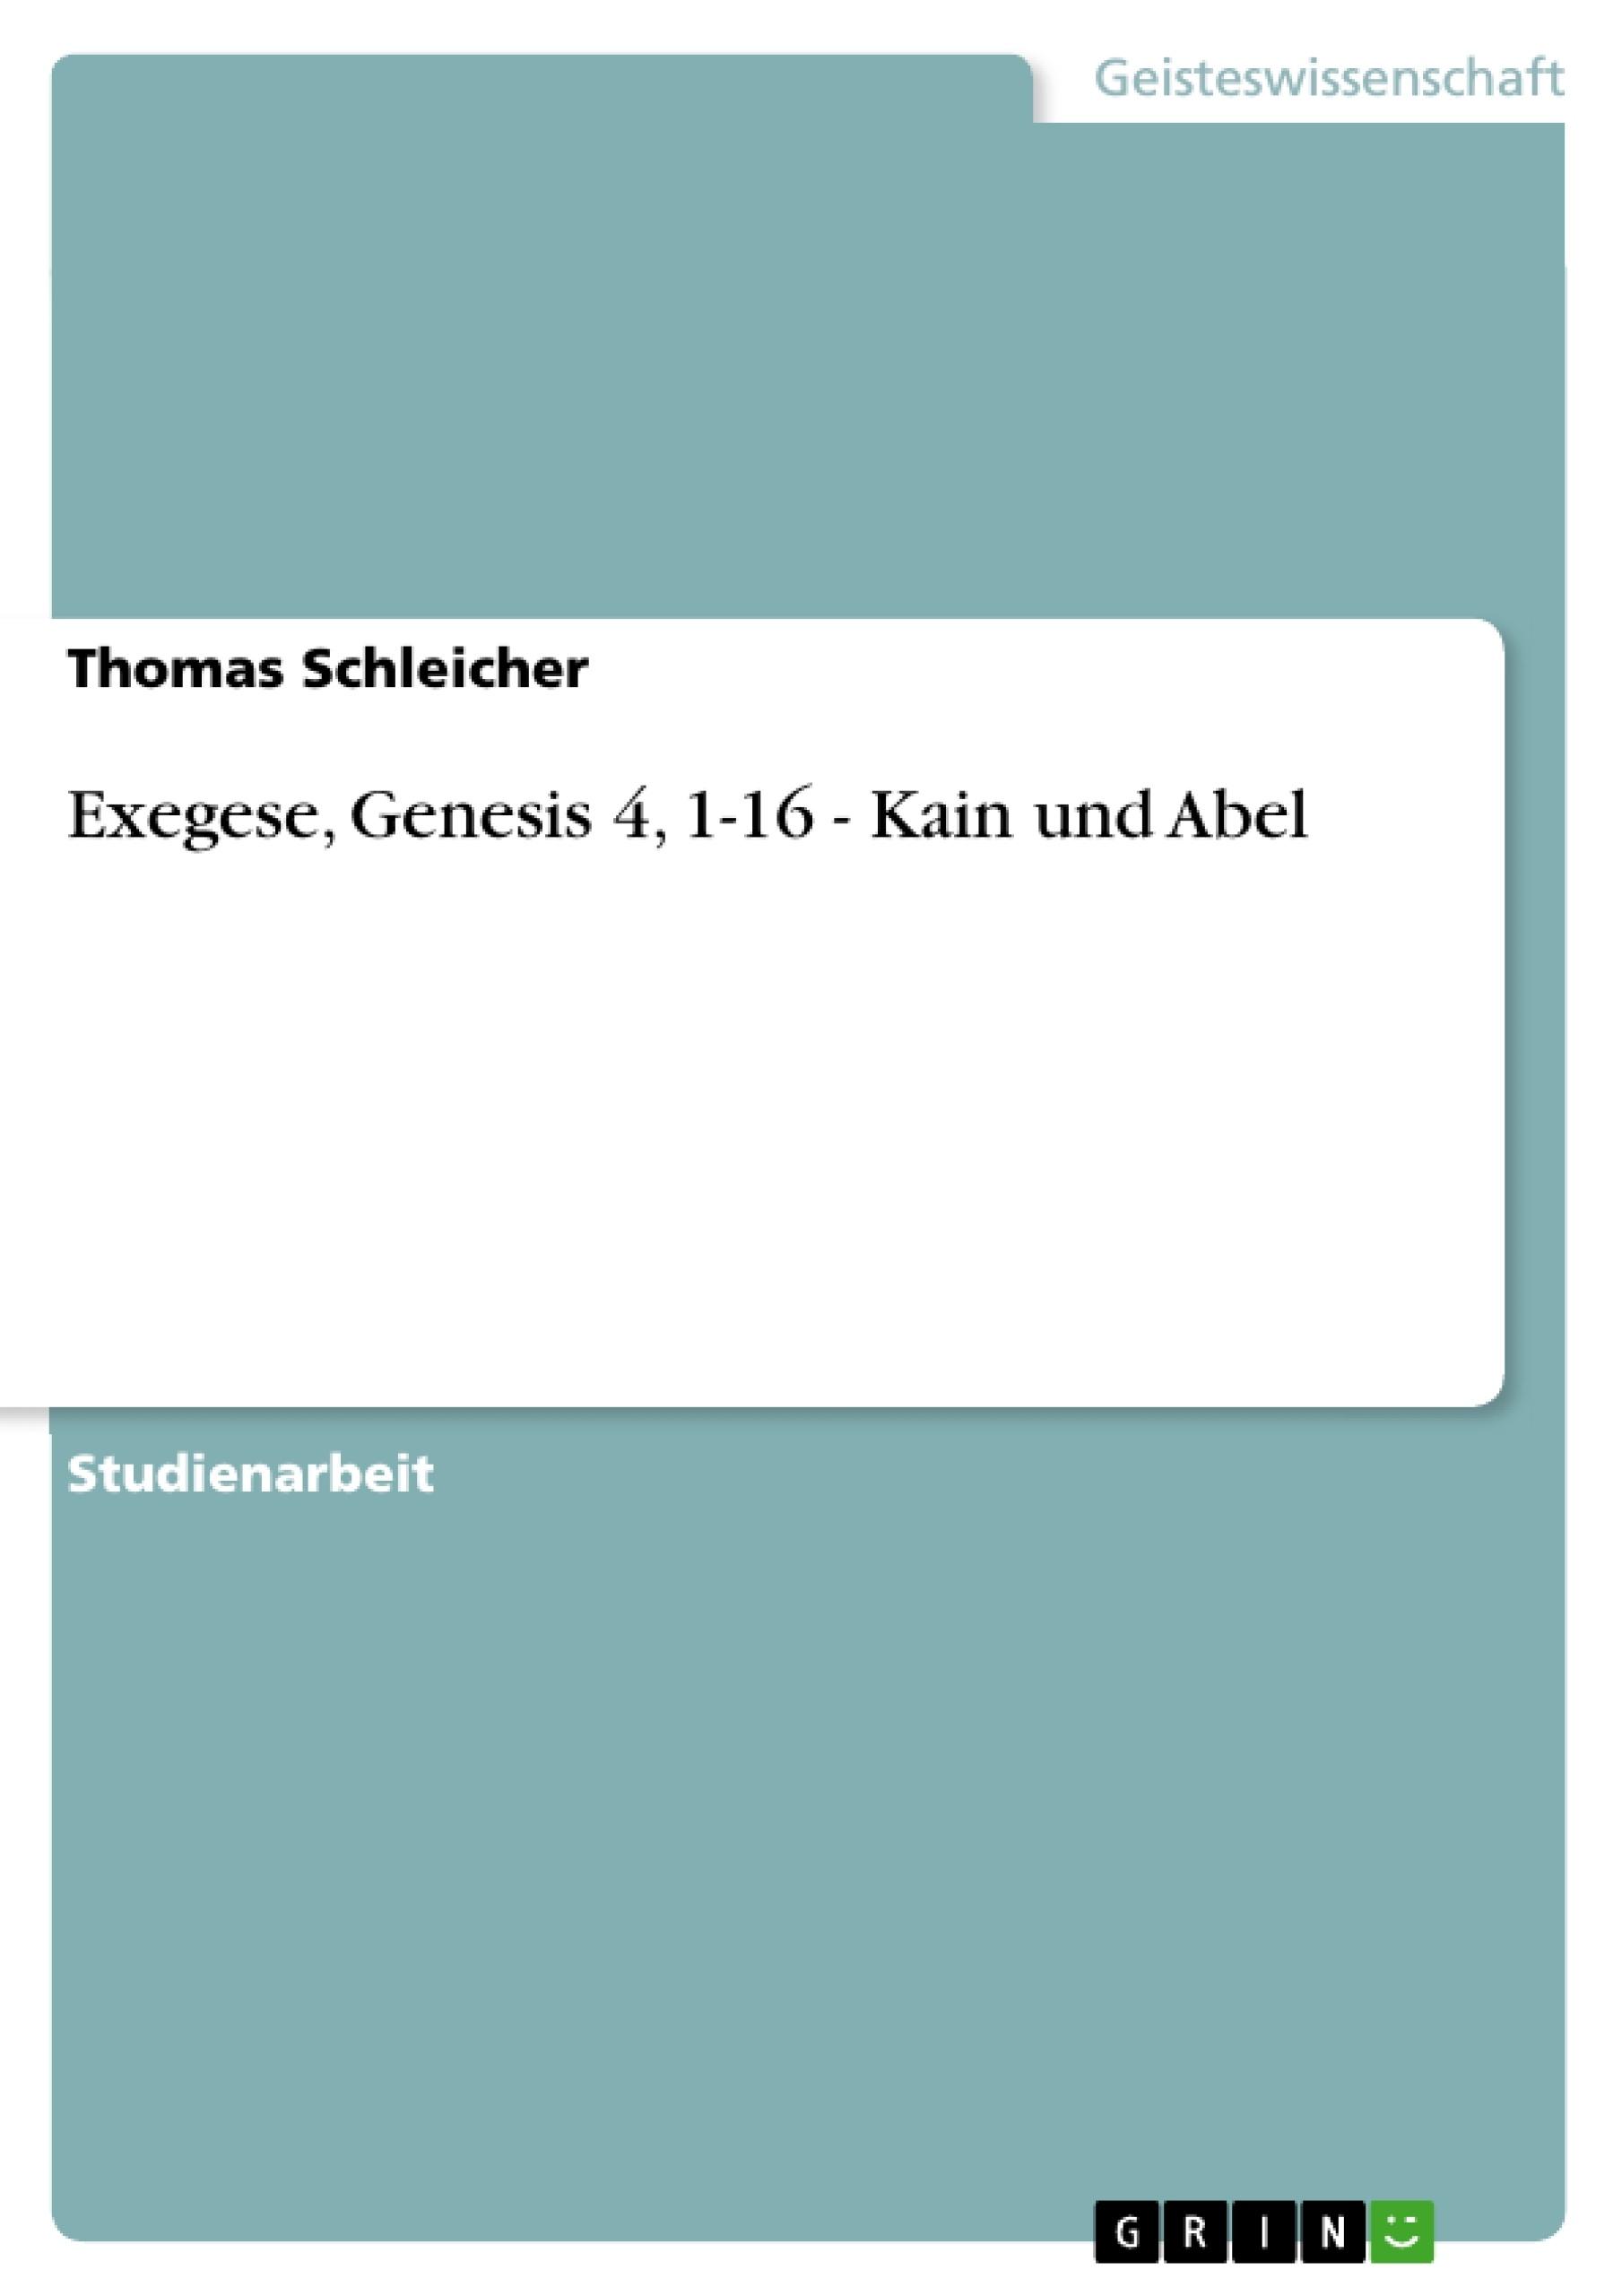 Titel: Exegese, Genesis 4, 1-16 - Kain und Abel